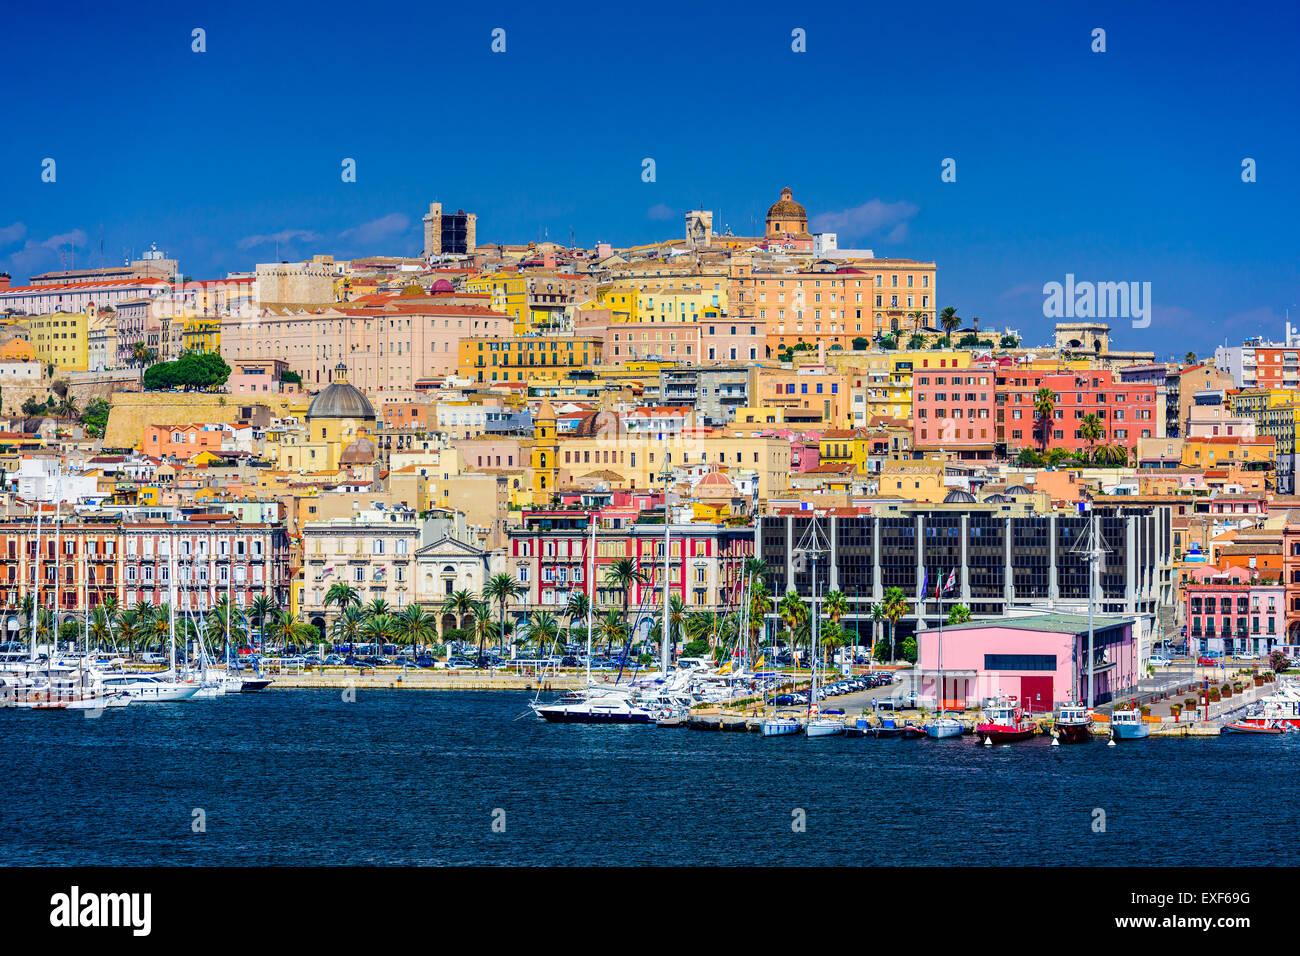 Cagliari, Sardaigne, Italie ville côtière sur la mer Méditerranée. Photo Stock